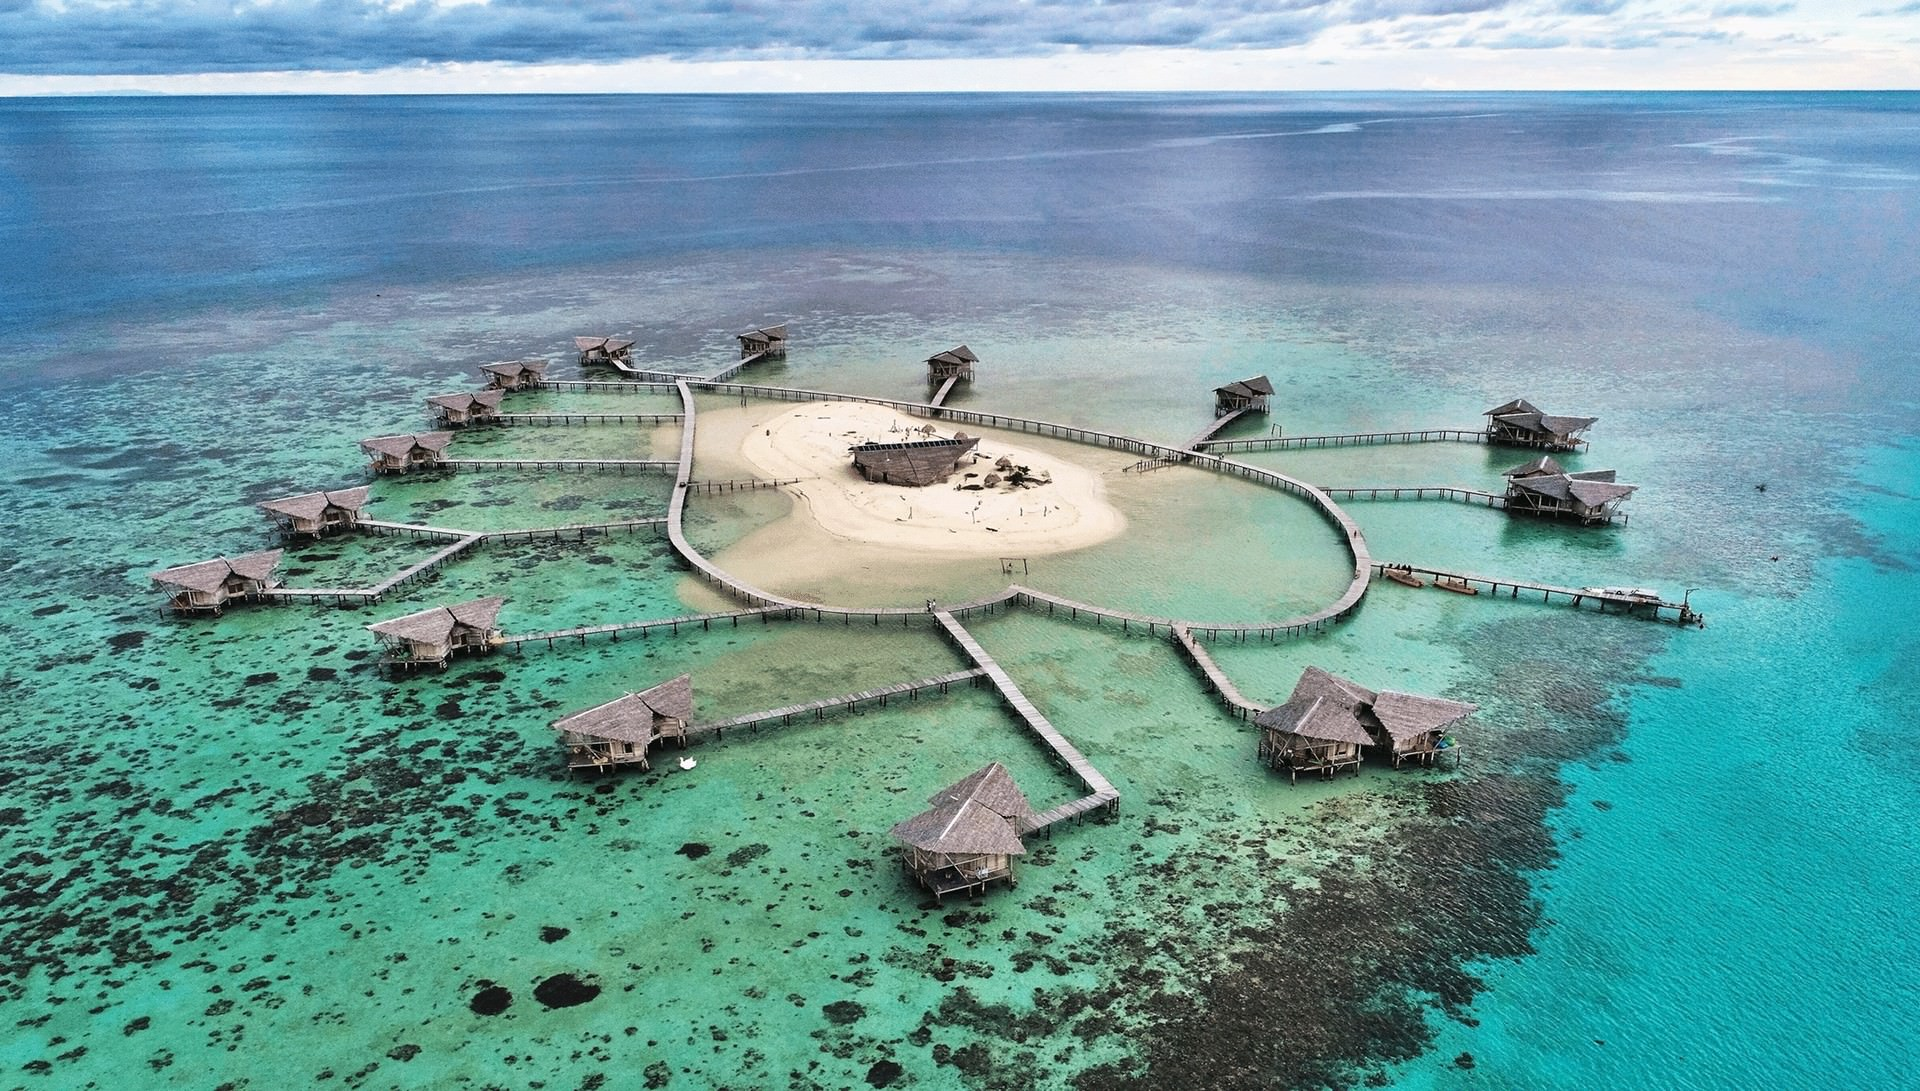 71 Gambar Pulau Cinta Gorontalo Terlihat Keren